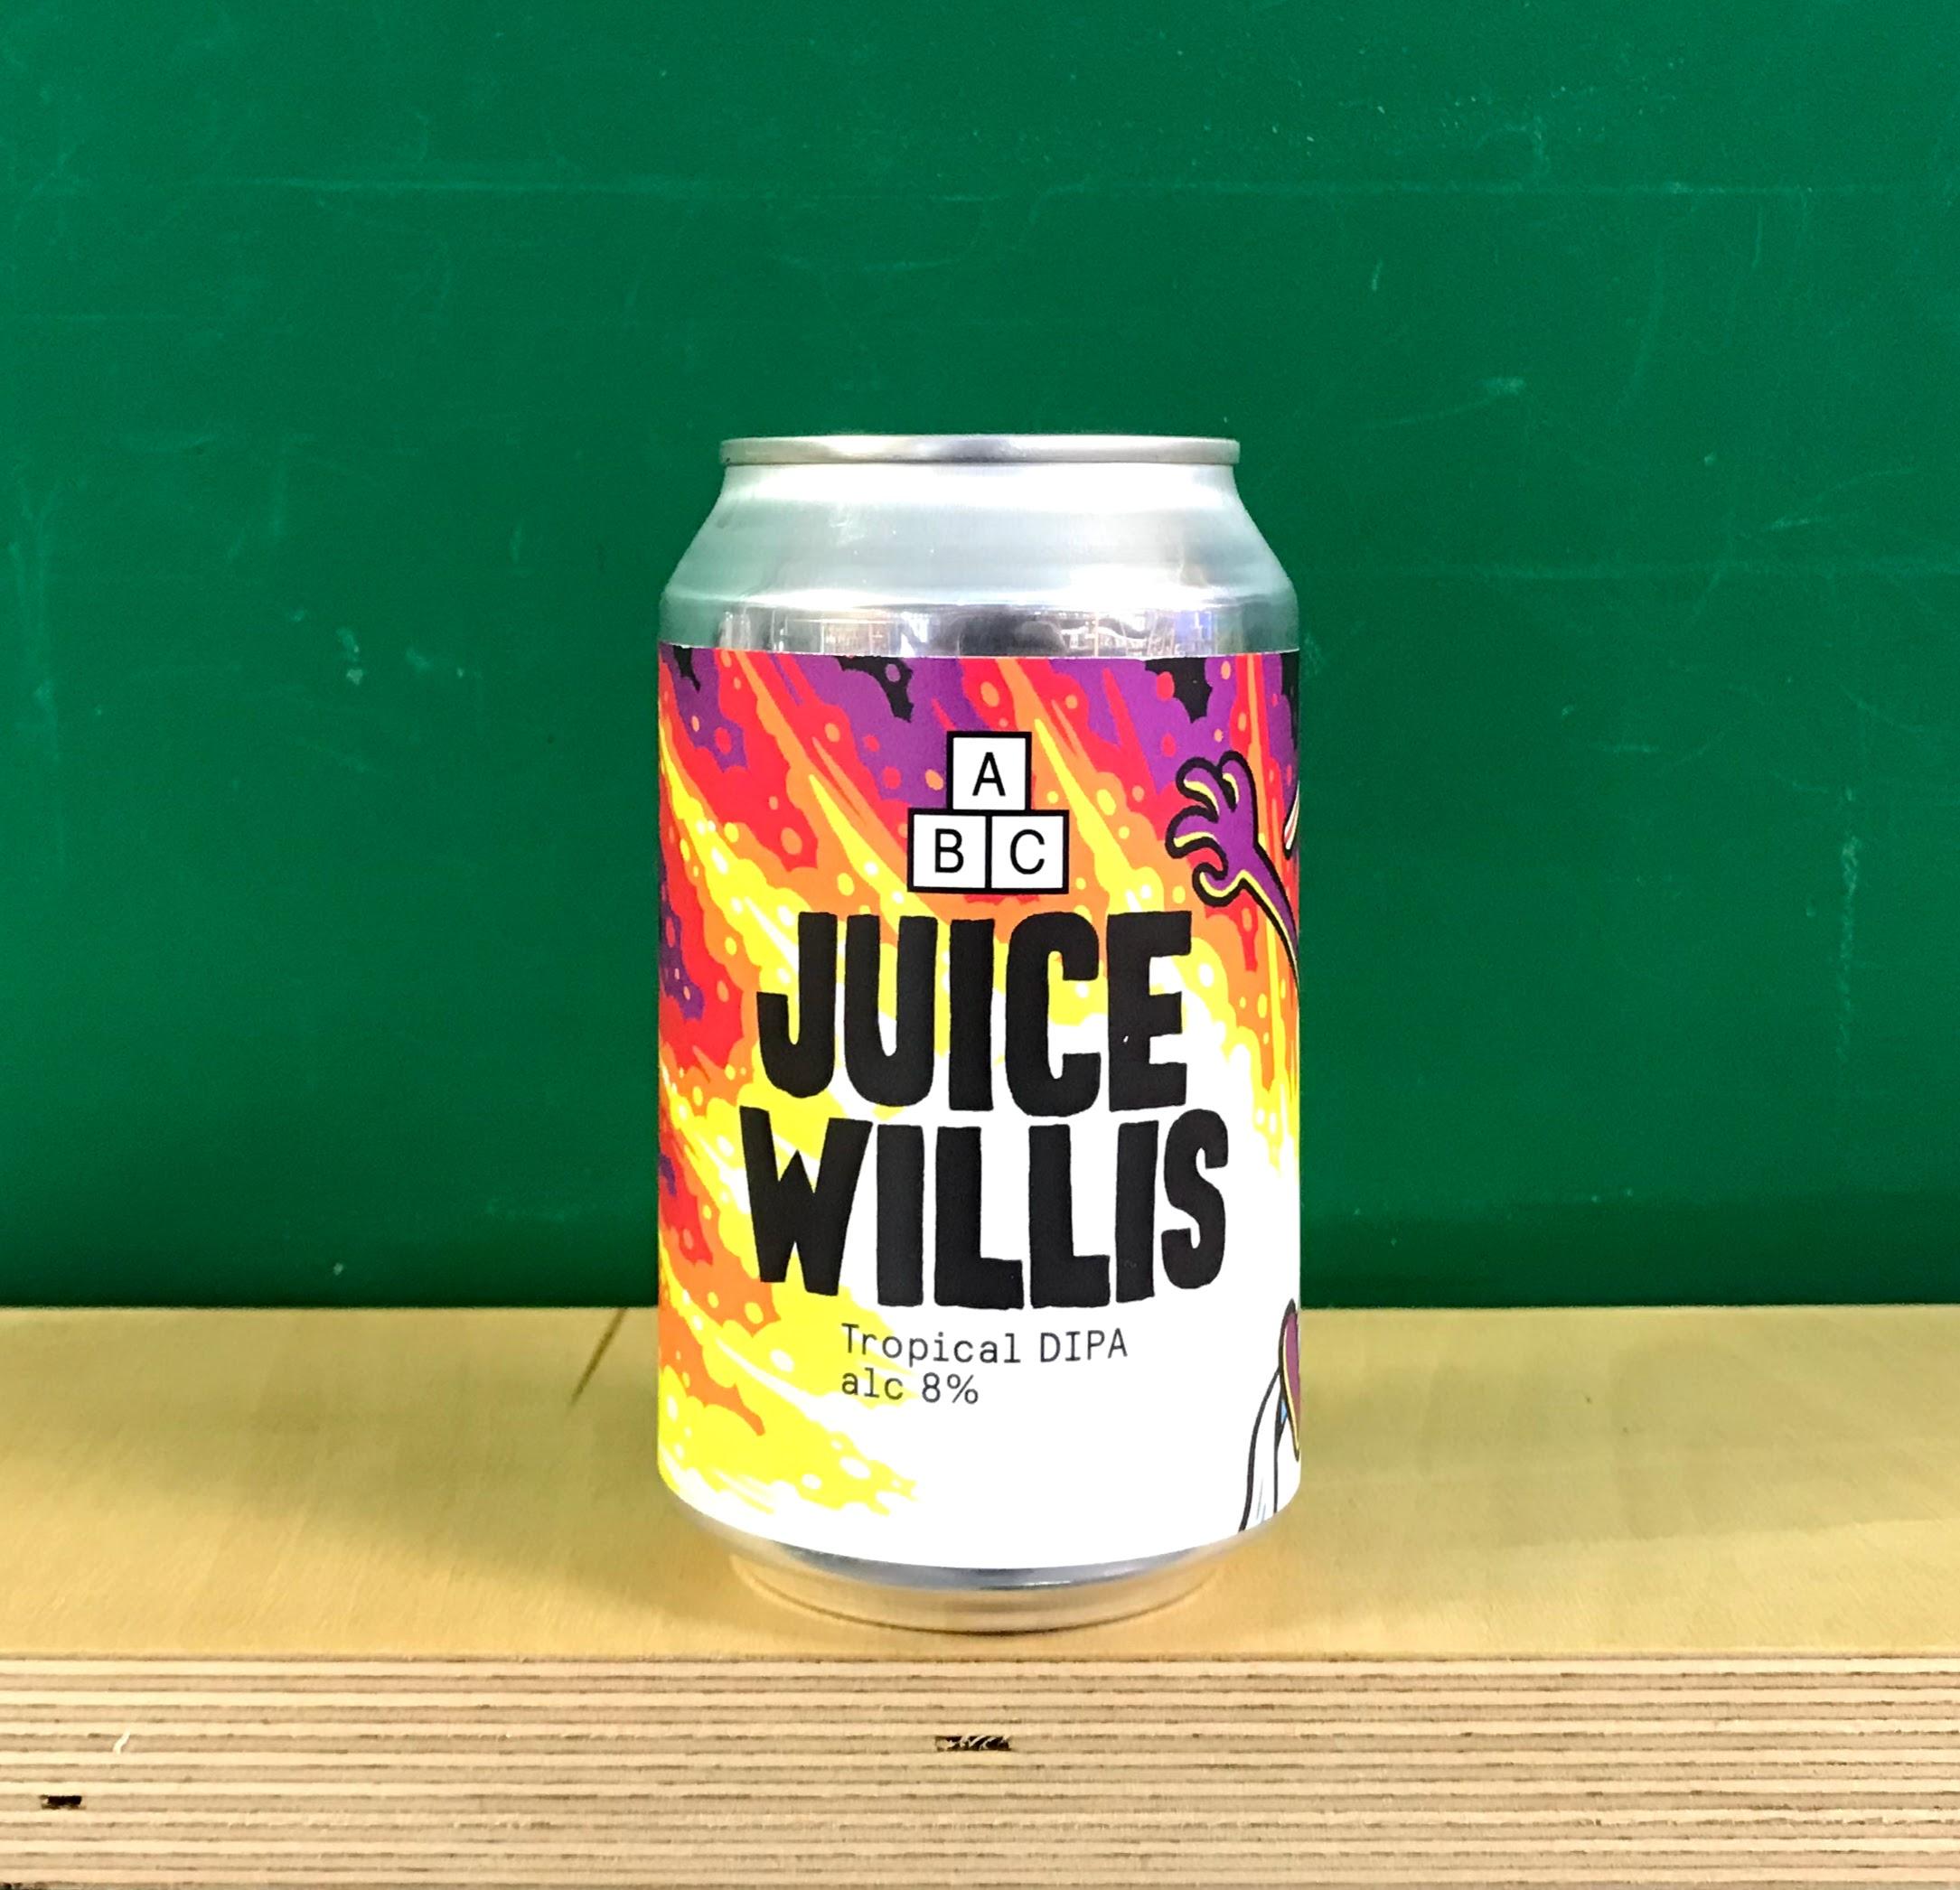 Alphabet Juice Willis